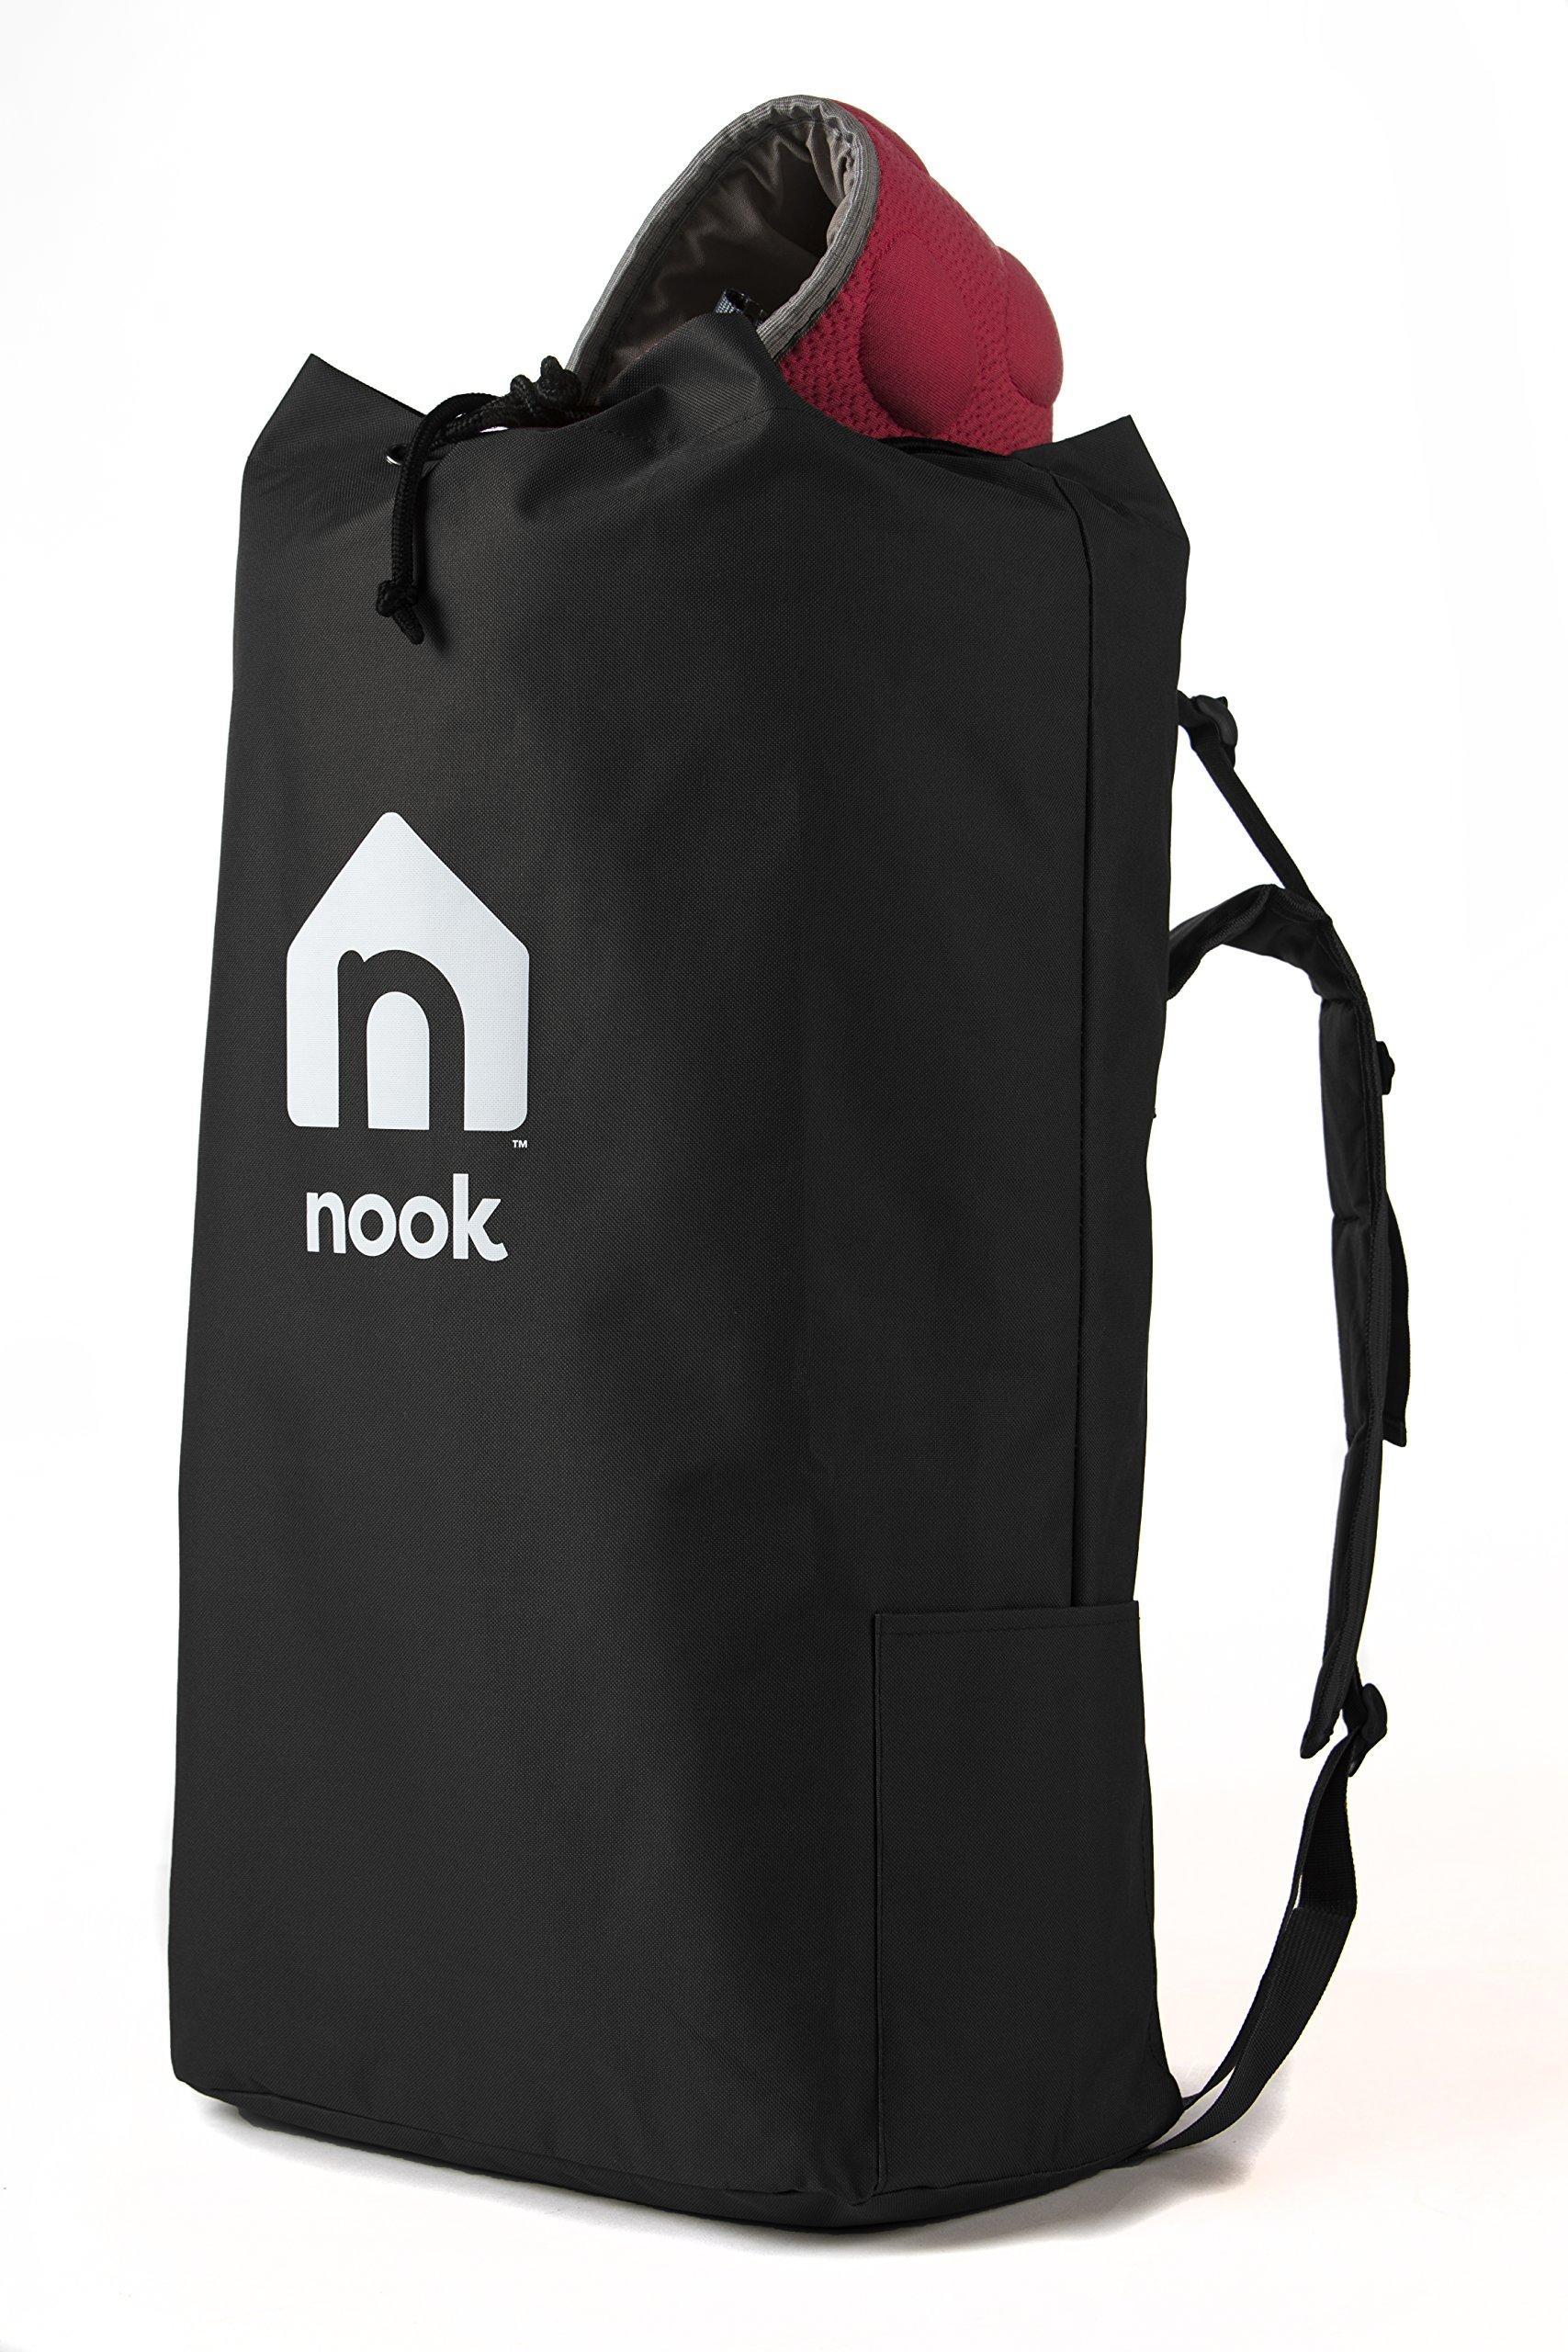 Nook Sleep LilyPad Playmat, Pacific by Nook Sleep (Image #7)